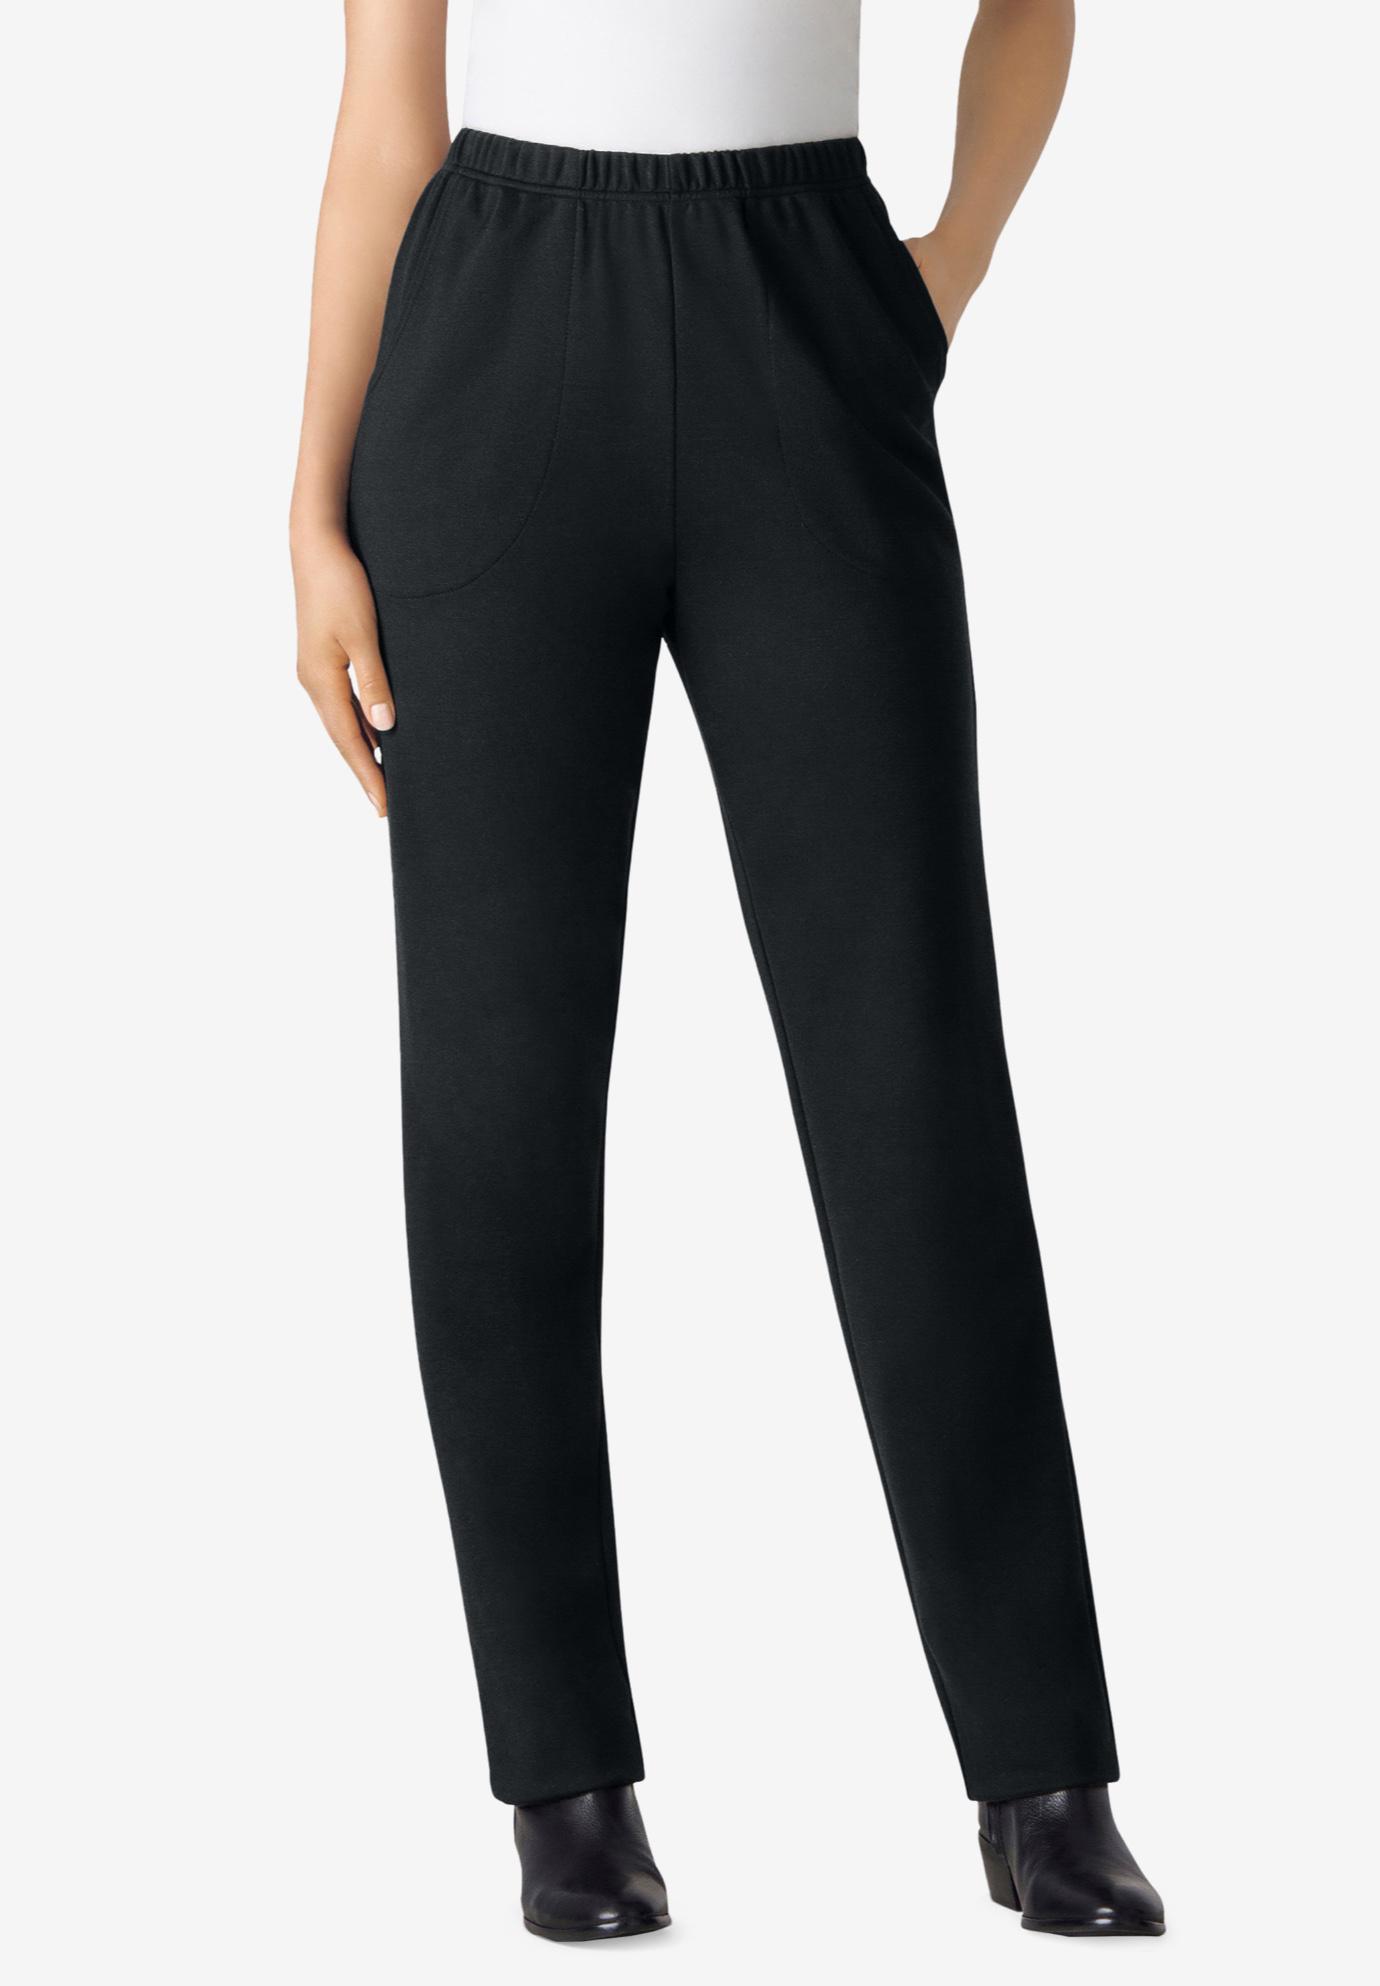 c2f05b84dca19 Straight Leg Ponte Knit Pant Plus Size Straight Leg Full Beauty